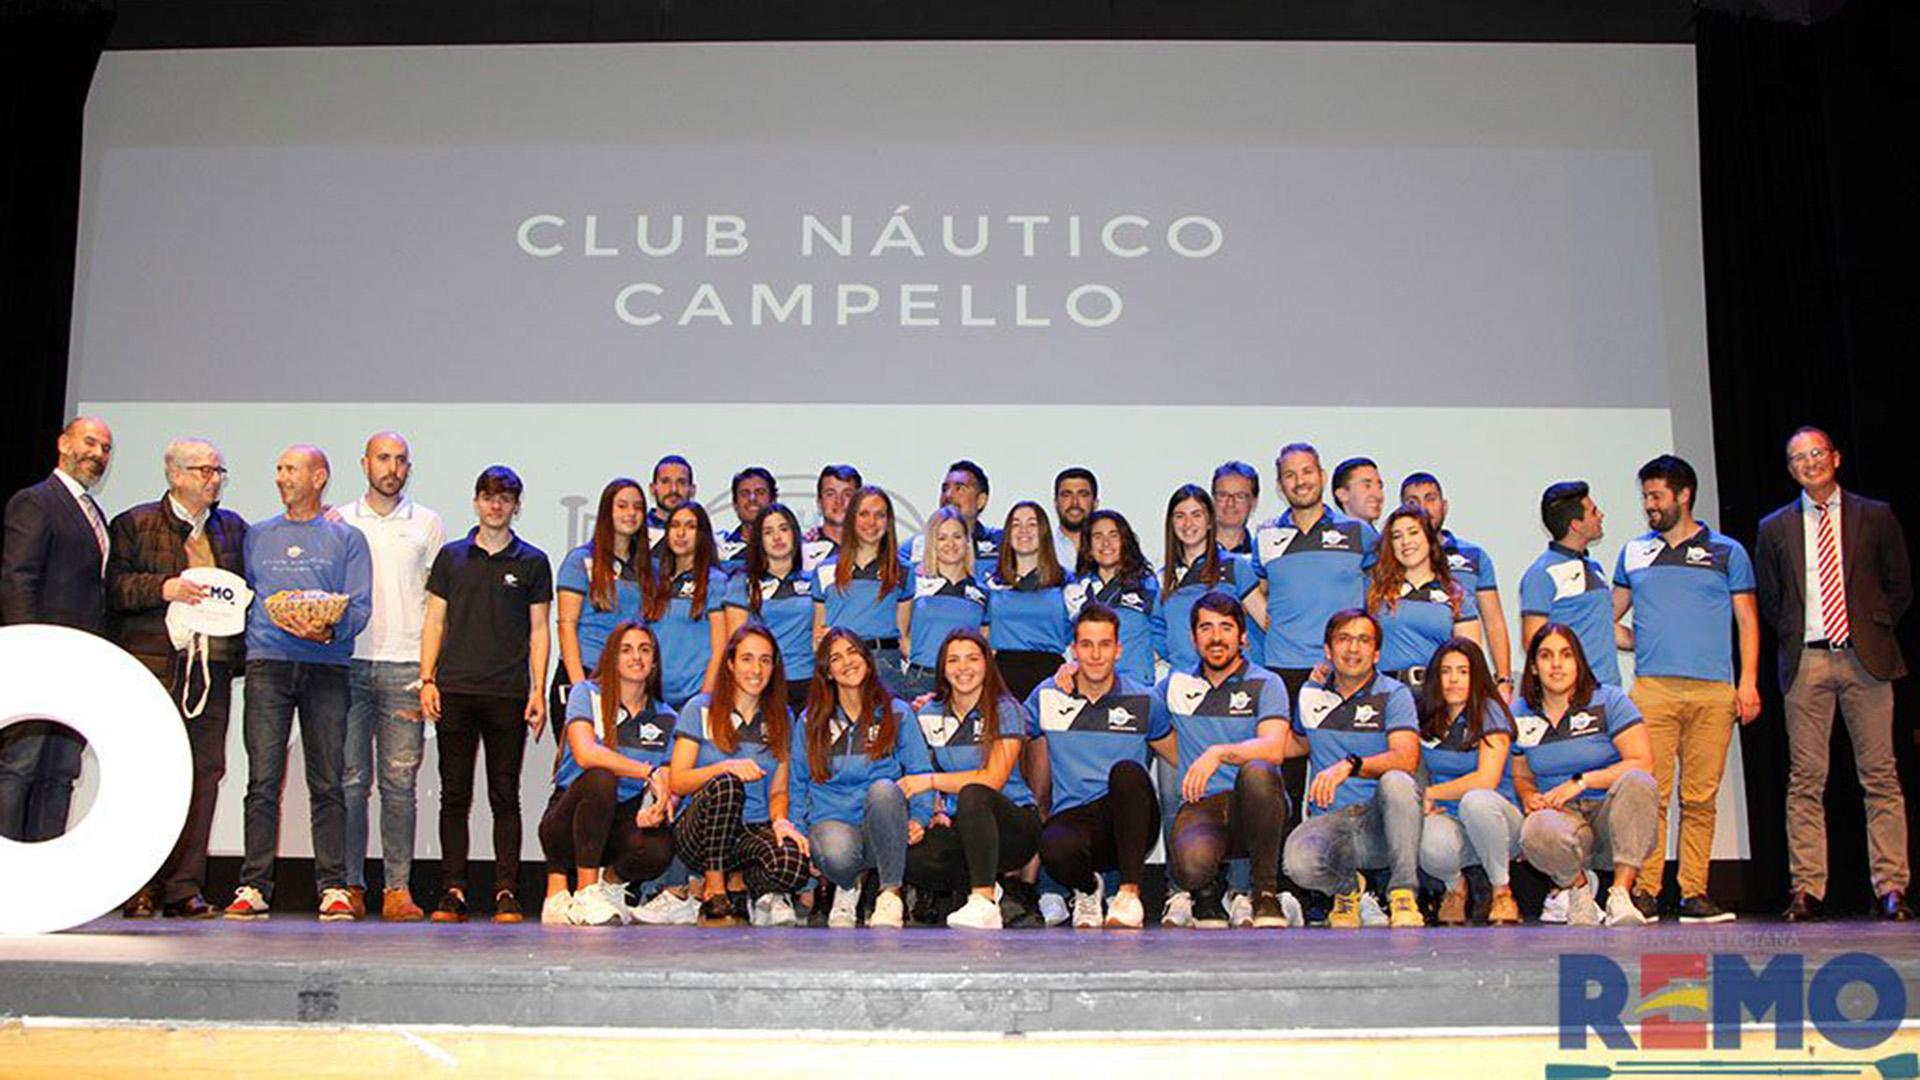 Gala del Remo 2019 - Club Náutico Campello